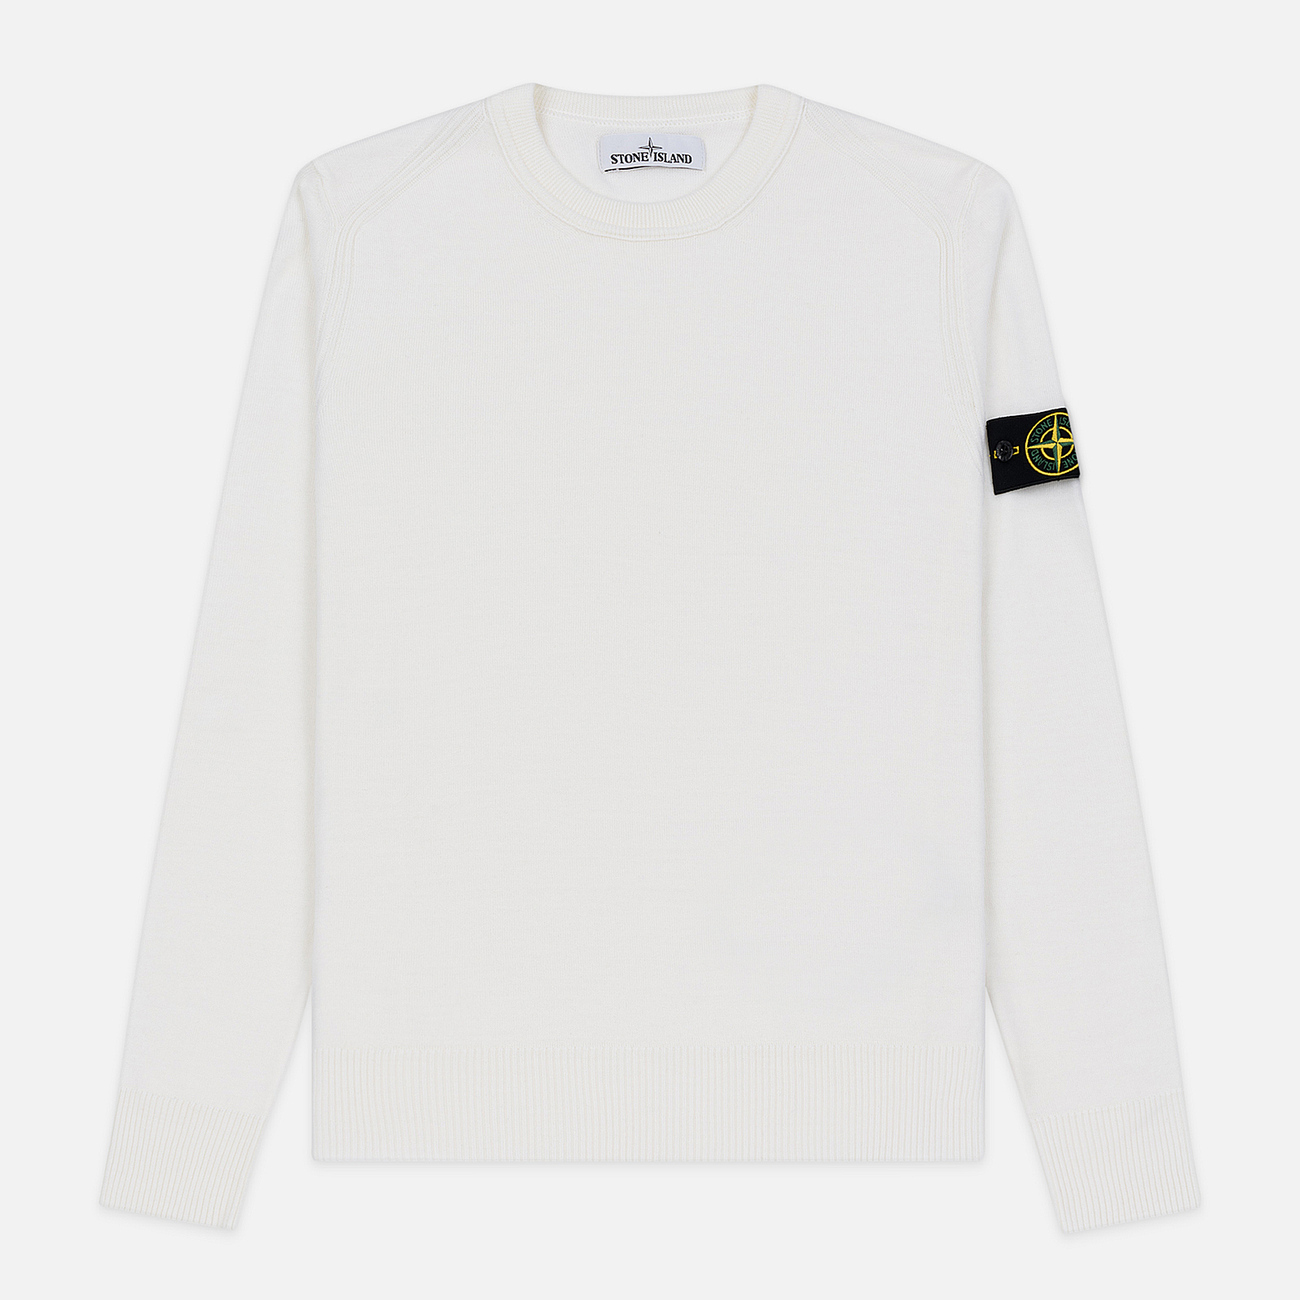 Мужской свитер Stone Island Crew Neck Lightweight Wool Natural White